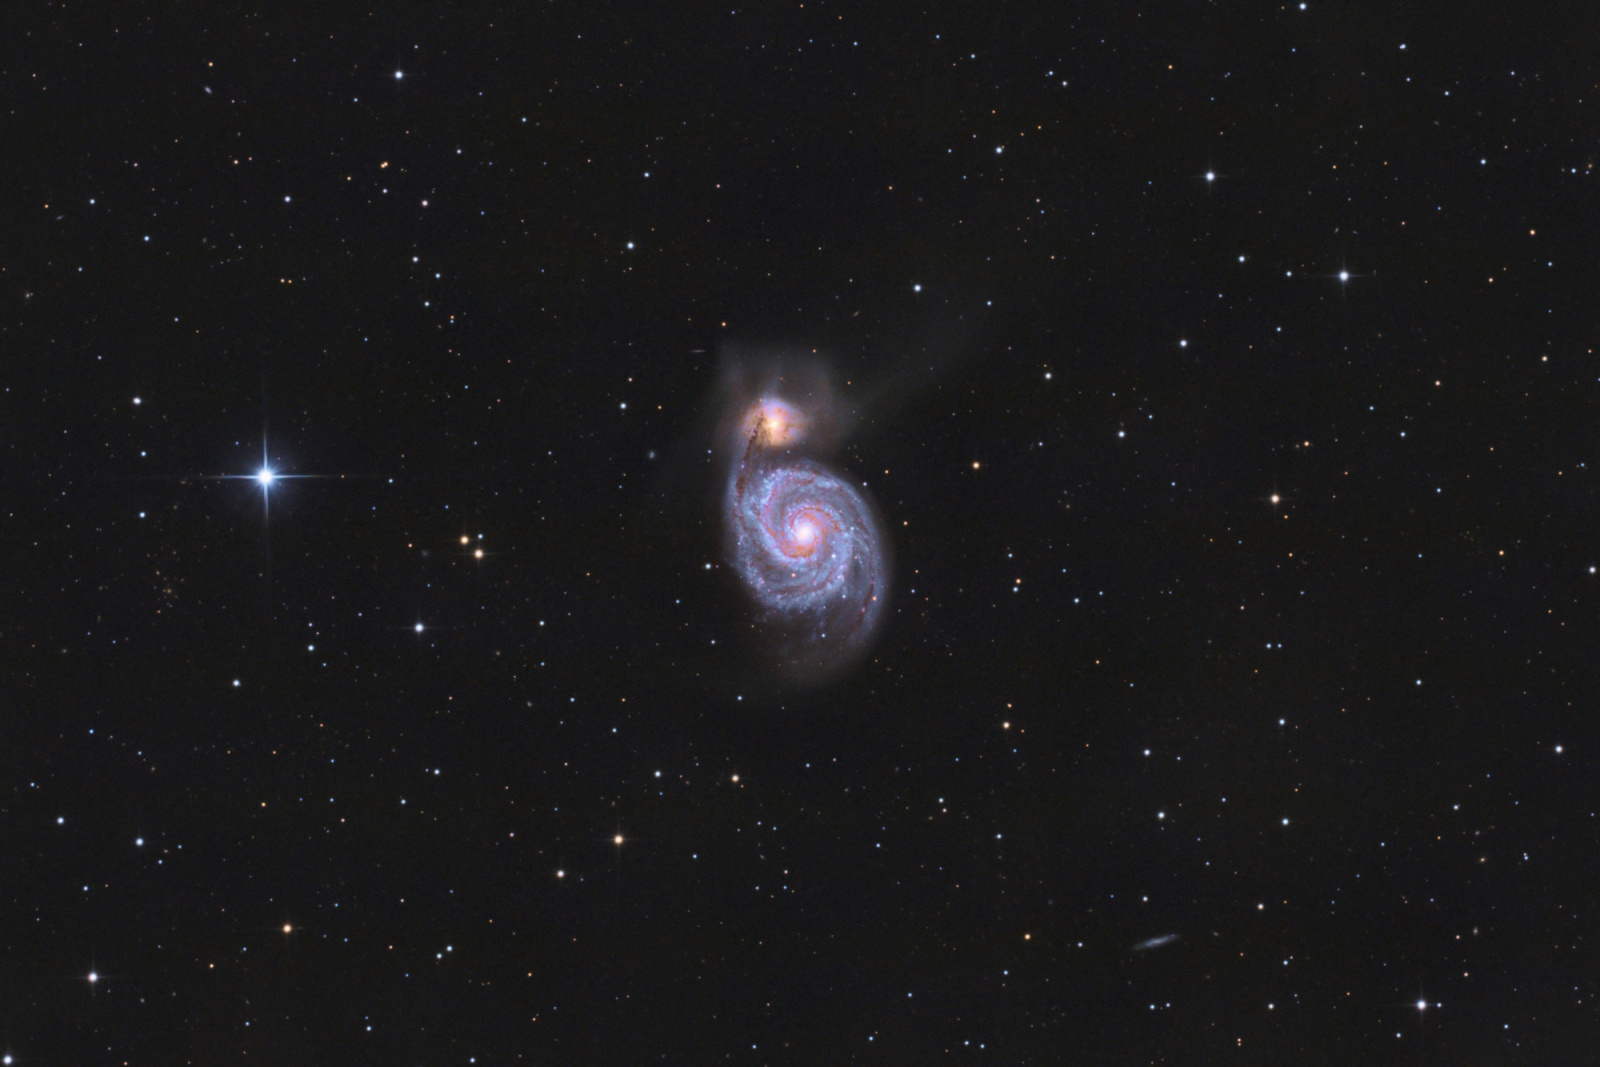 M51_color_reg V3 JPG astropolis.jpg